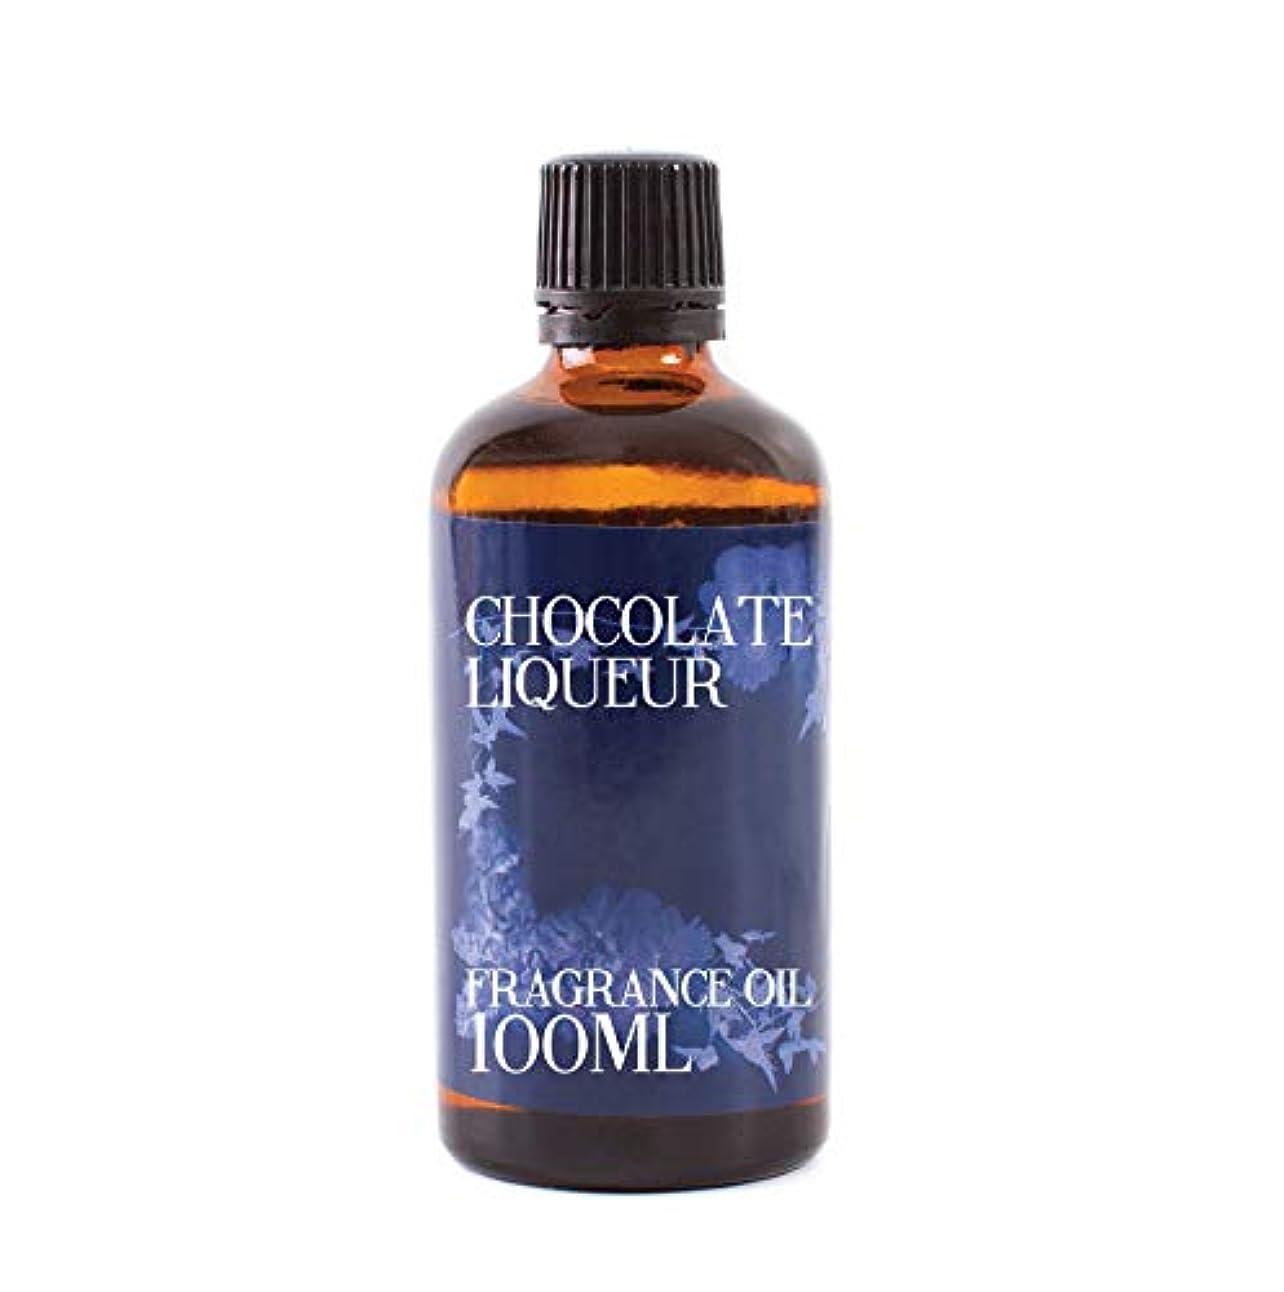 Mystic Moments | Chocolate Liqueur Fragrance Oil - 100ml